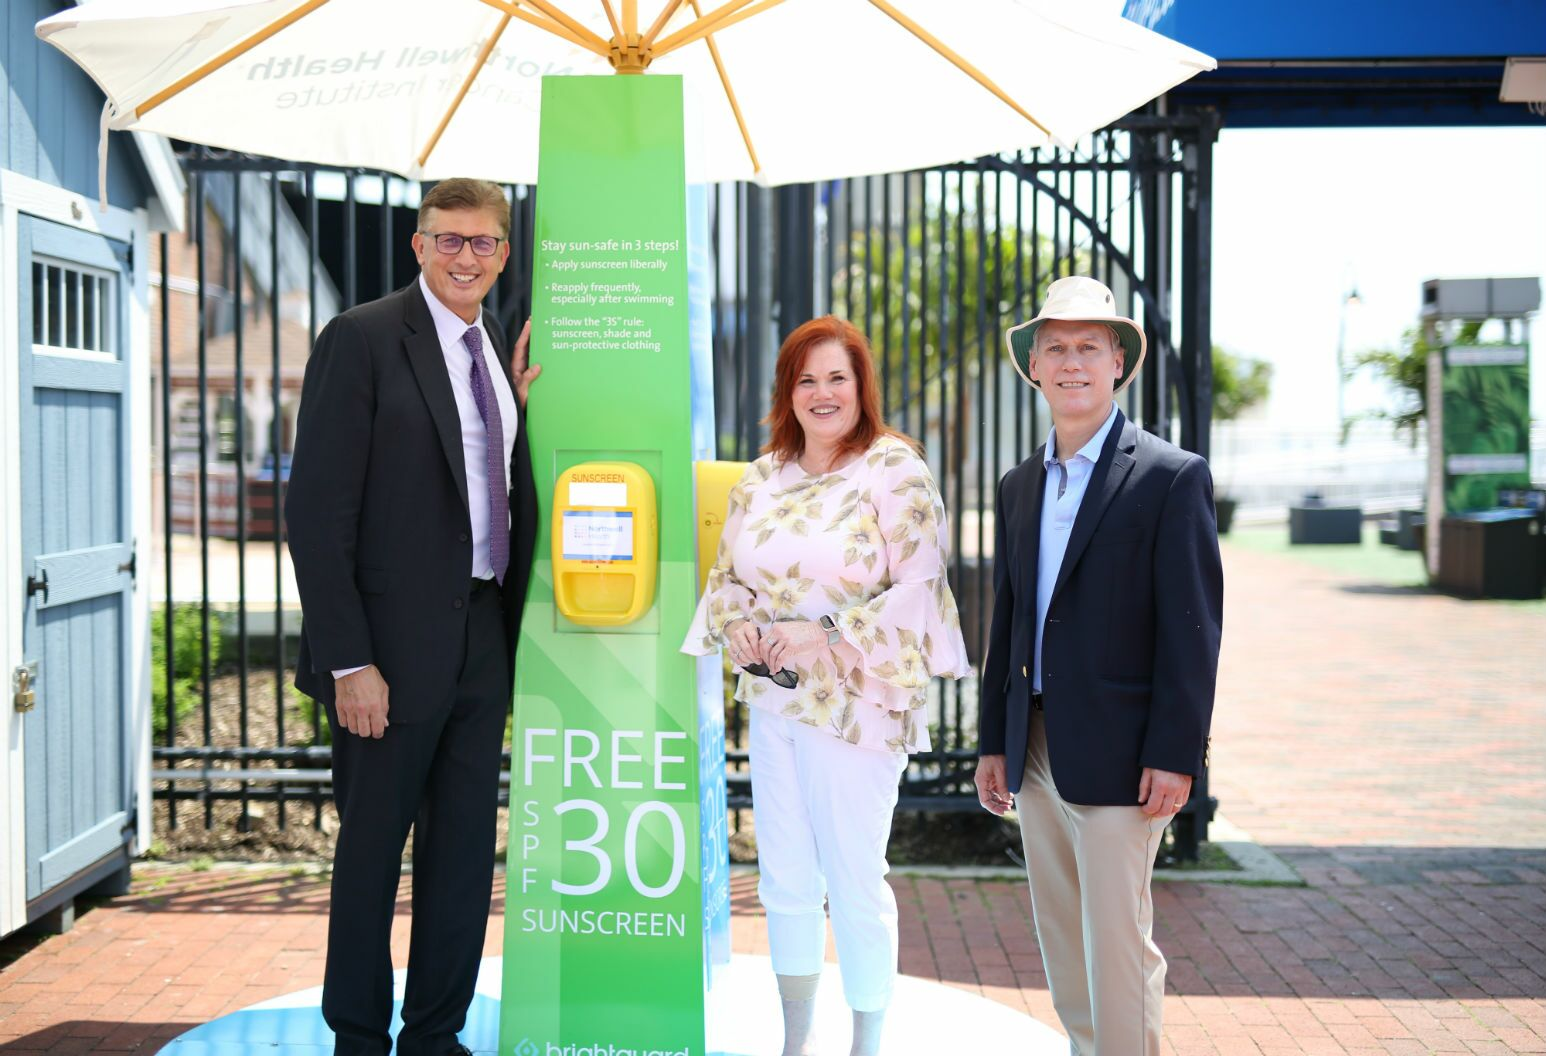 Northwell Health sponsors over 150 free sunscreen dispensers across